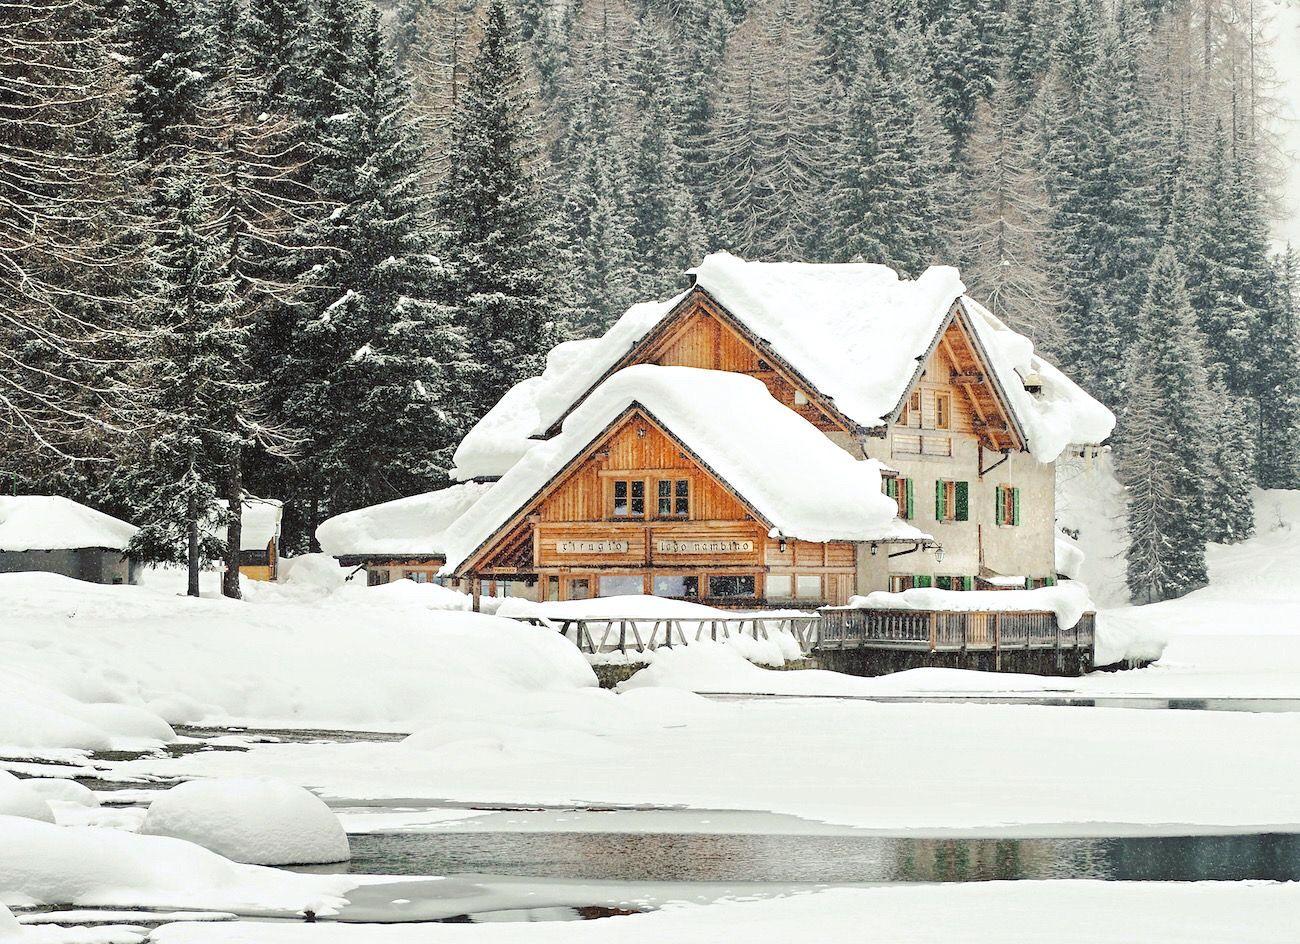 lago nambino inverno